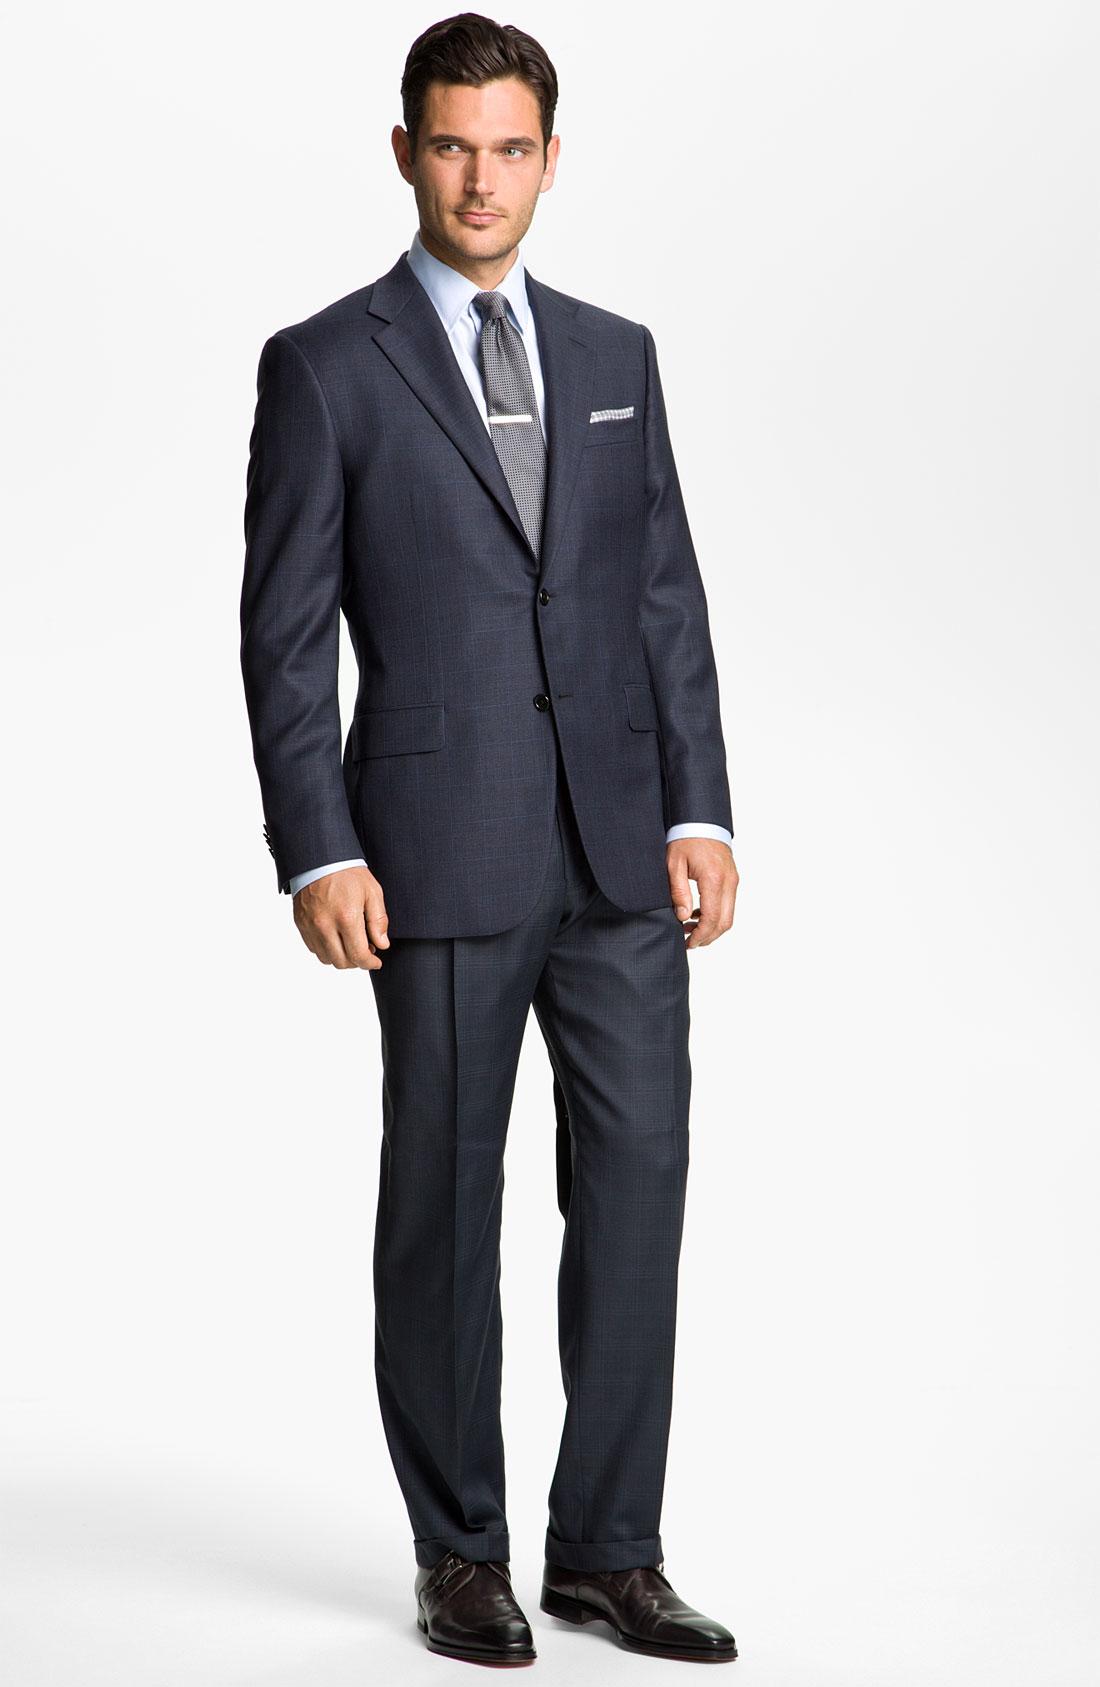 Lyst - Hickey Freeman Windowpane Suit in Blue for Men